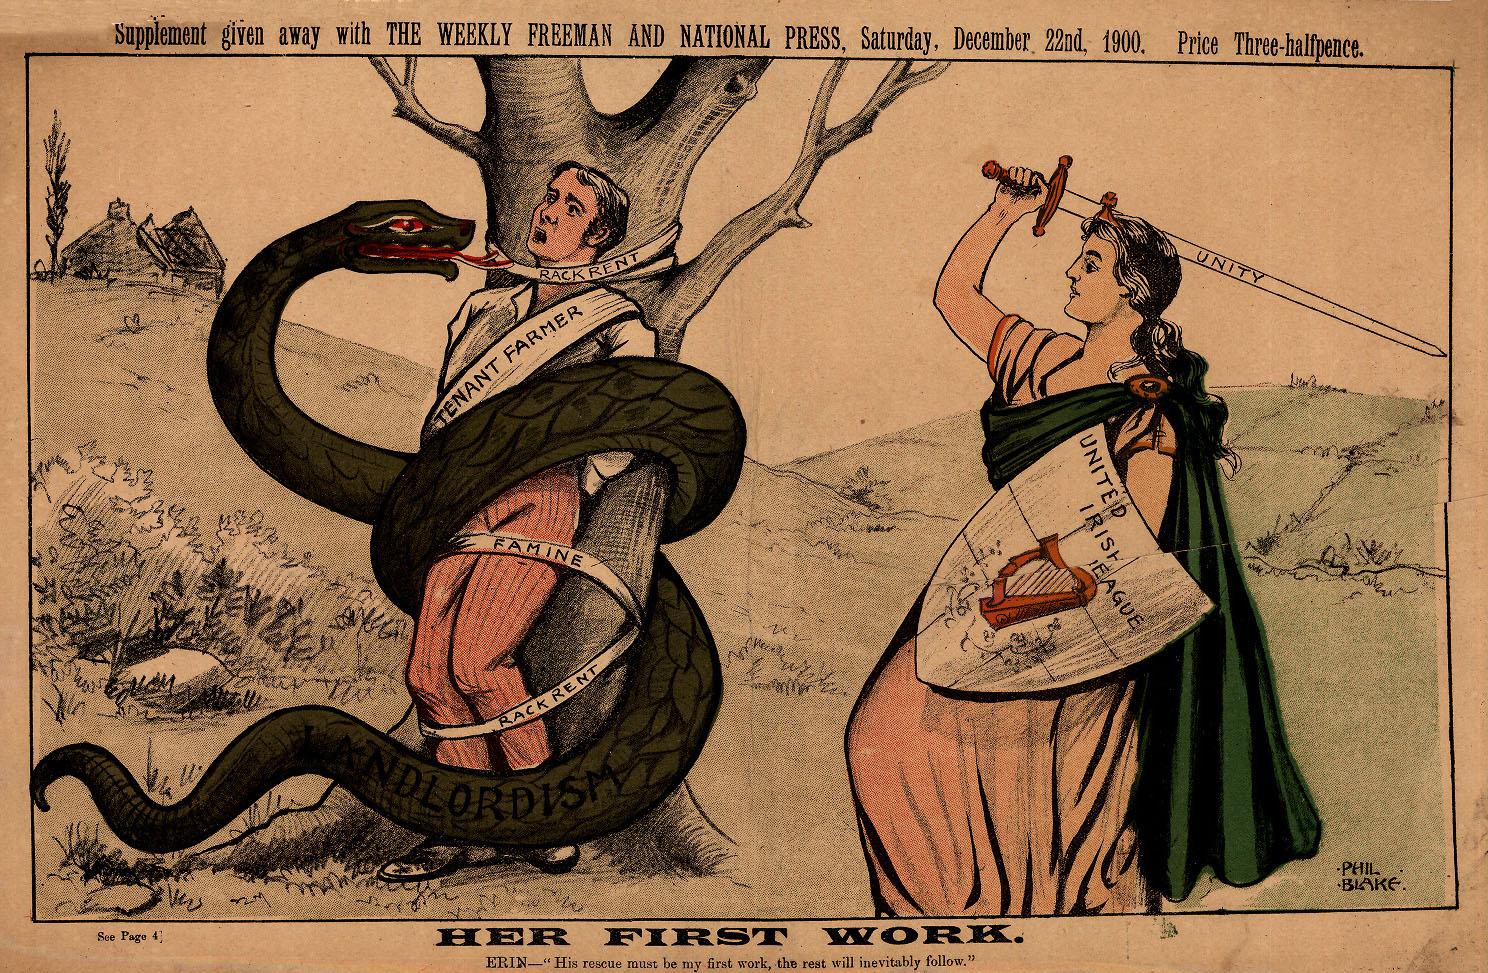 Reversed gender roles in a Phil Blake cartoon from the Weekly Freeman, 1900